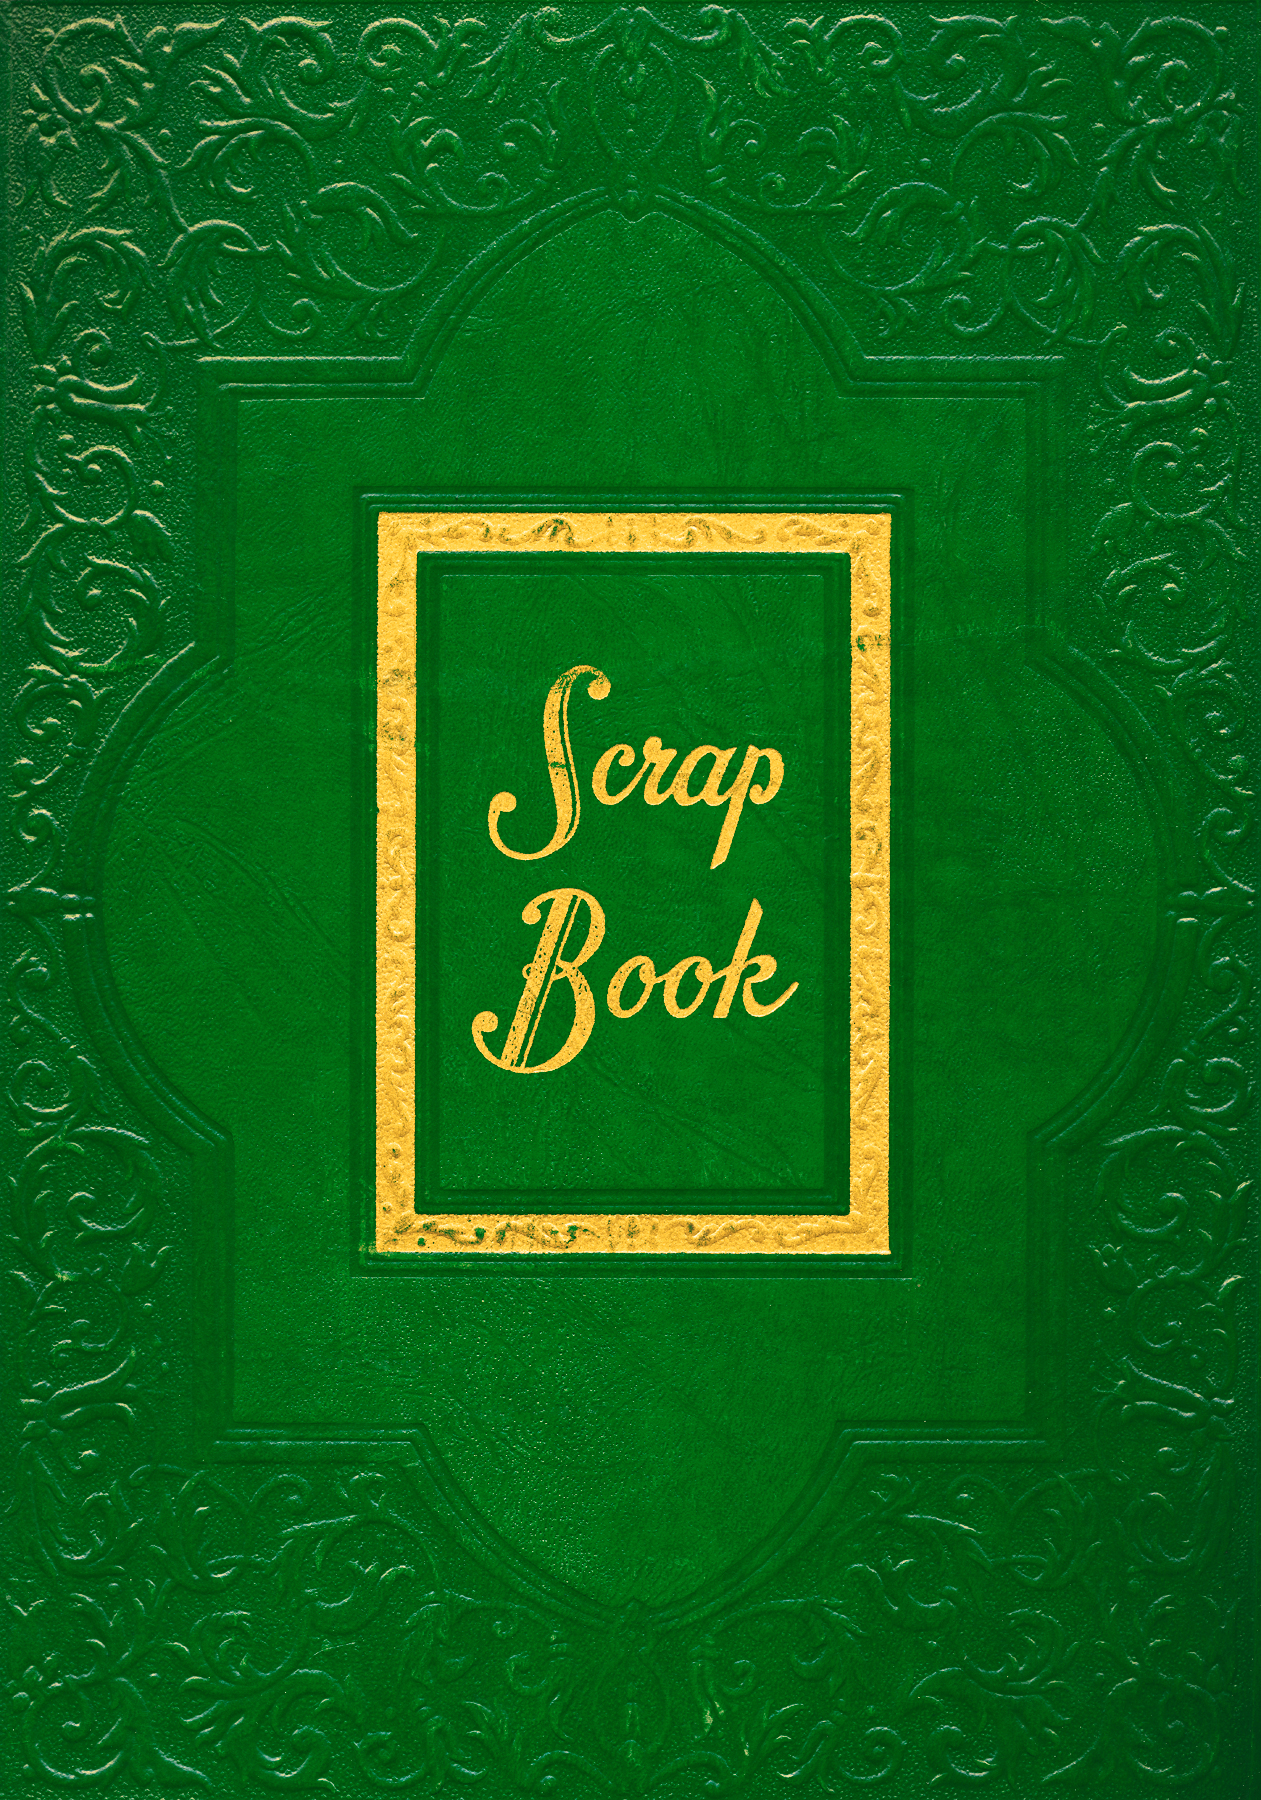 Vintage Scrapbook Cover - Green, Age, Read, Scrapbook, Scrap, HQ Photo